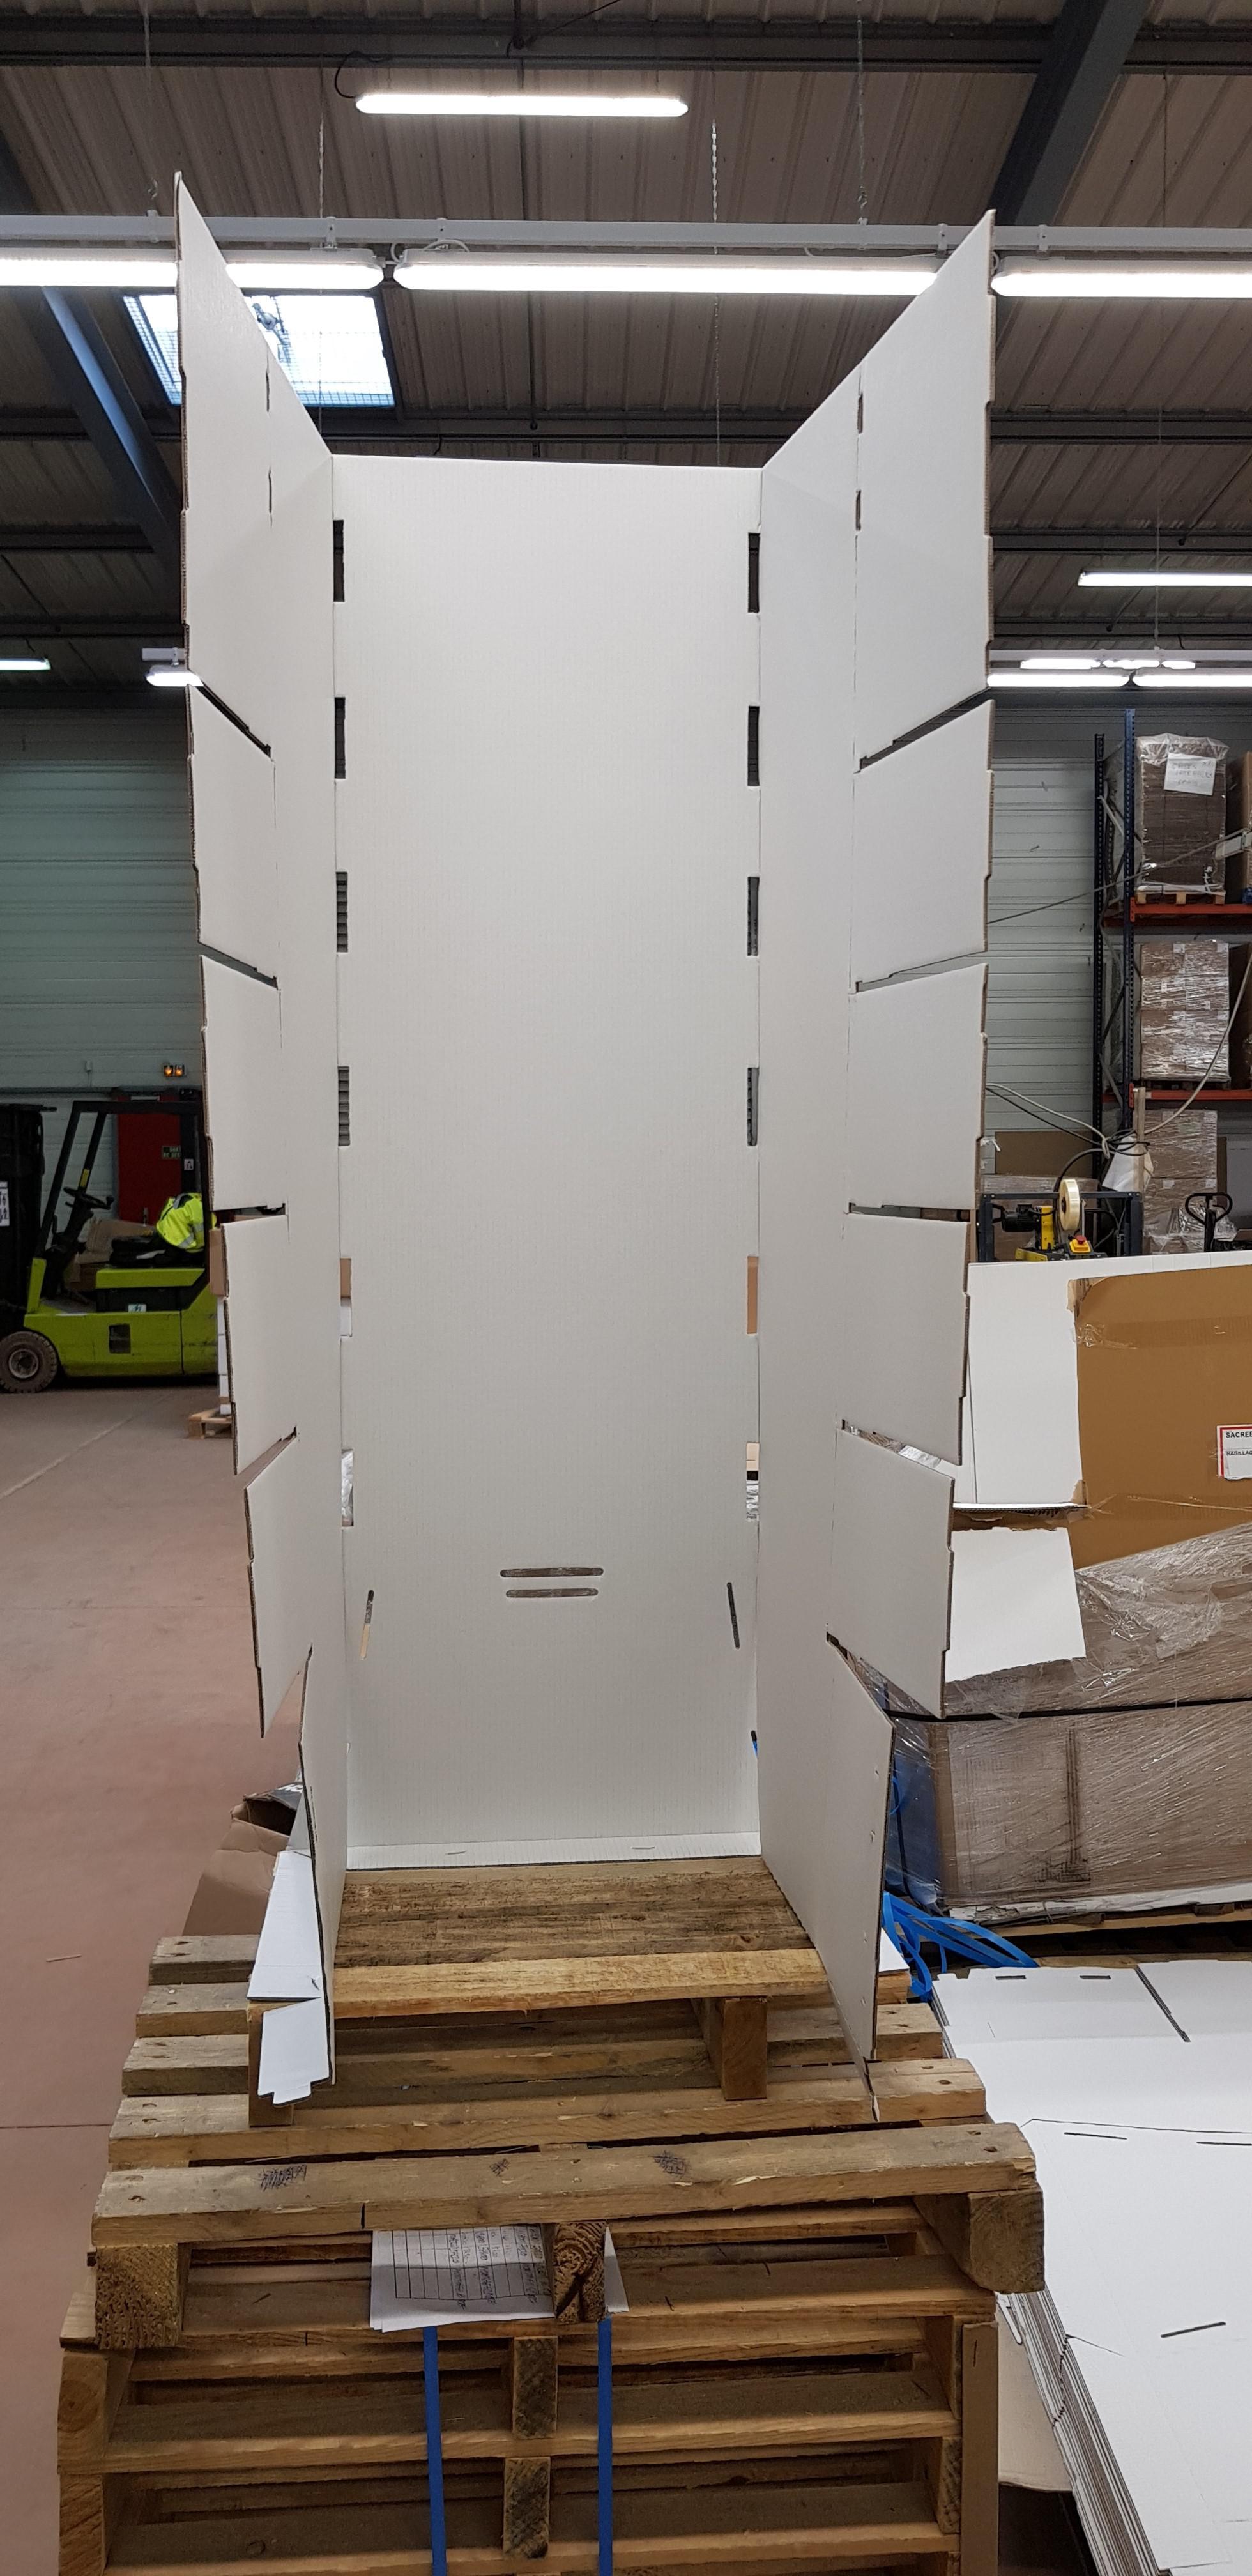 box4-ConvertImage